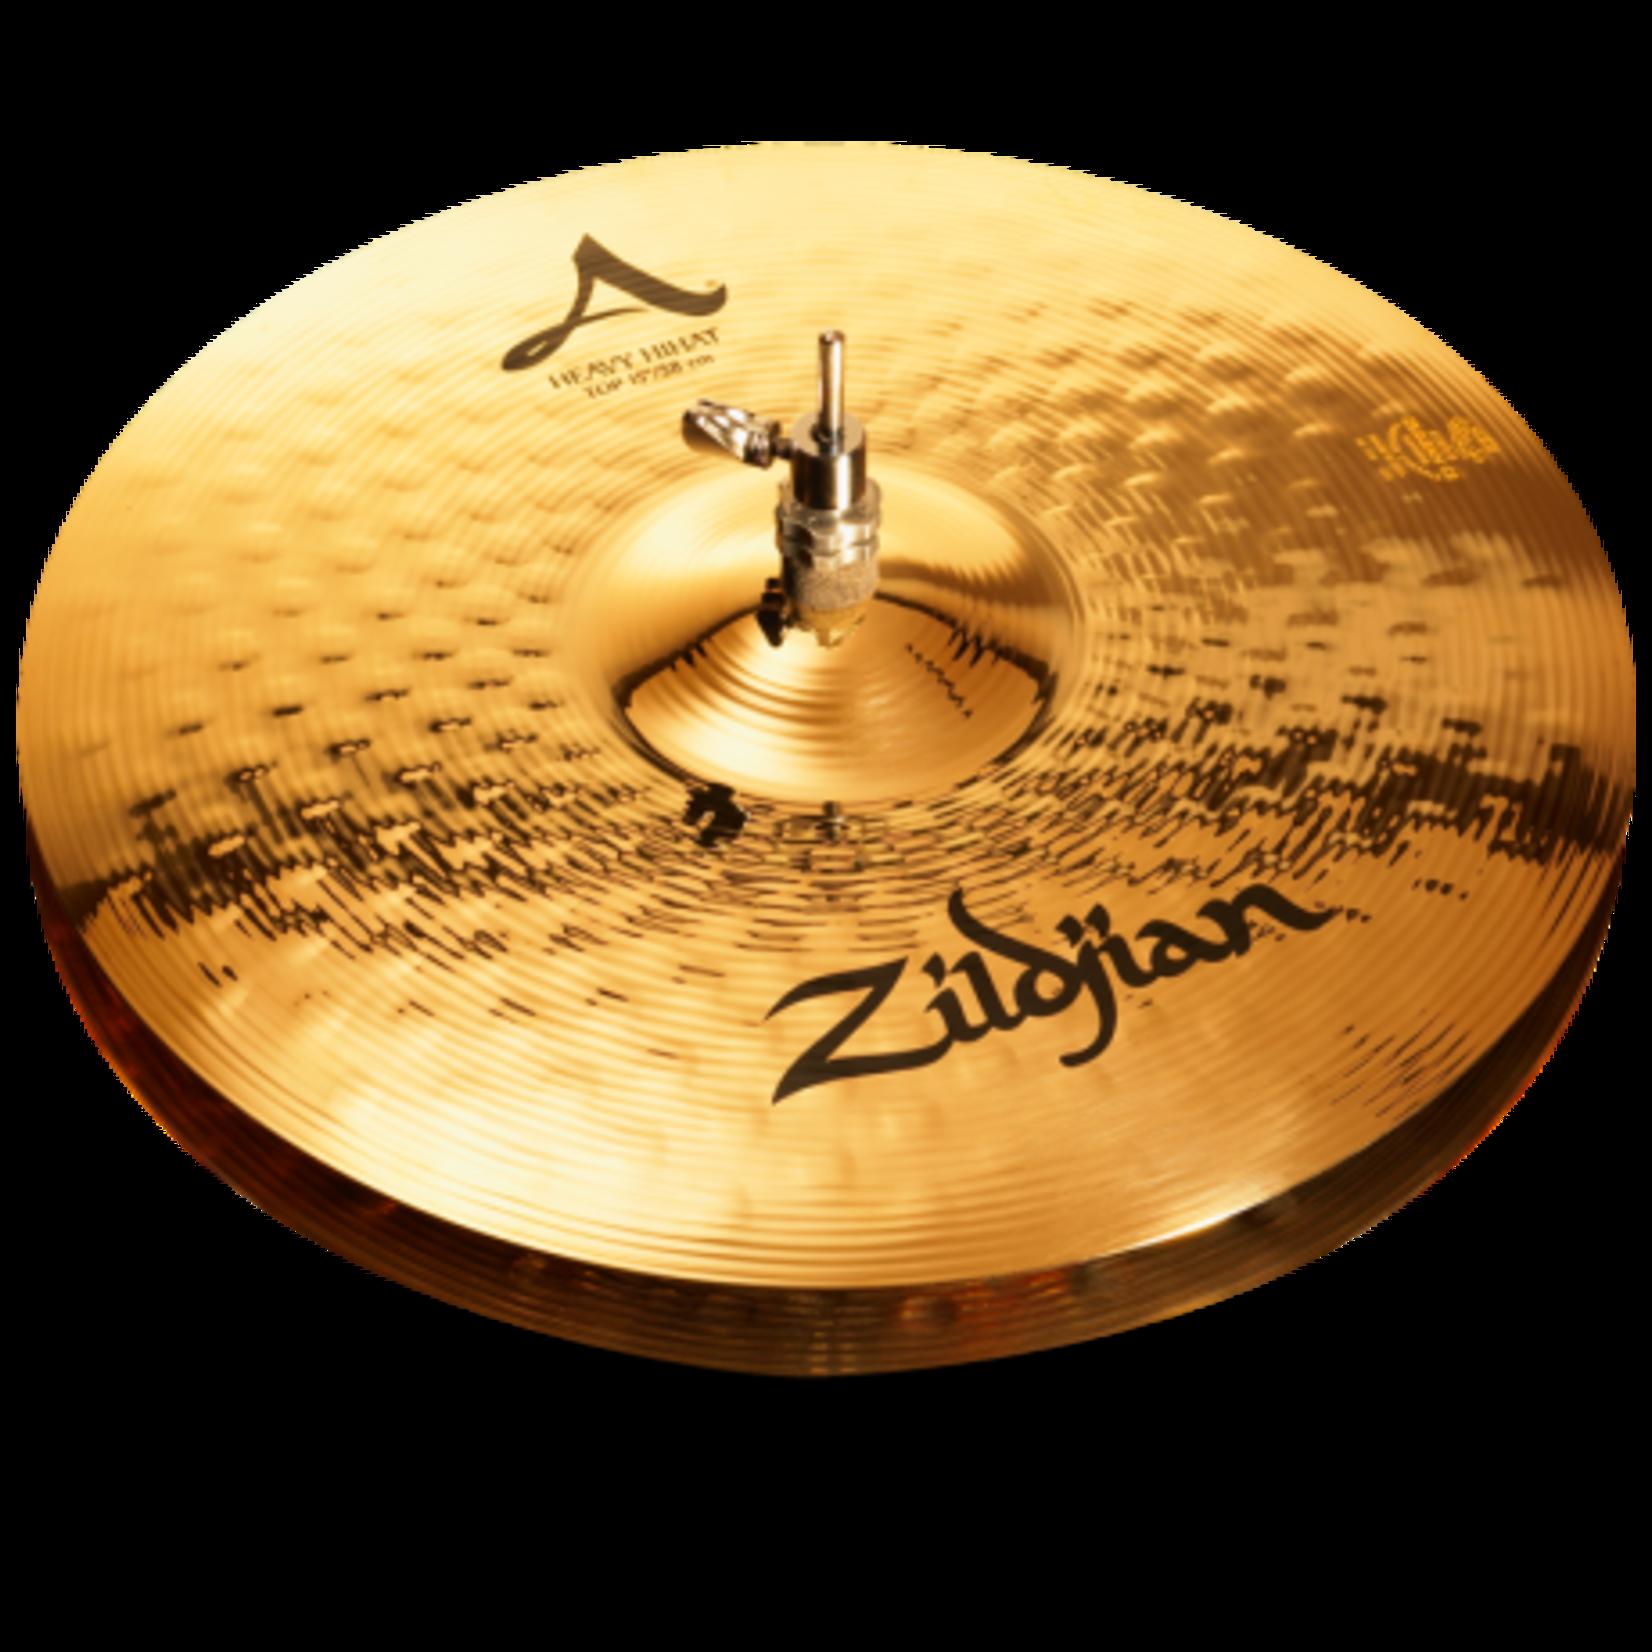 "Zildjian Zildjian 15"" A Heavy Hihats, Brilliant"